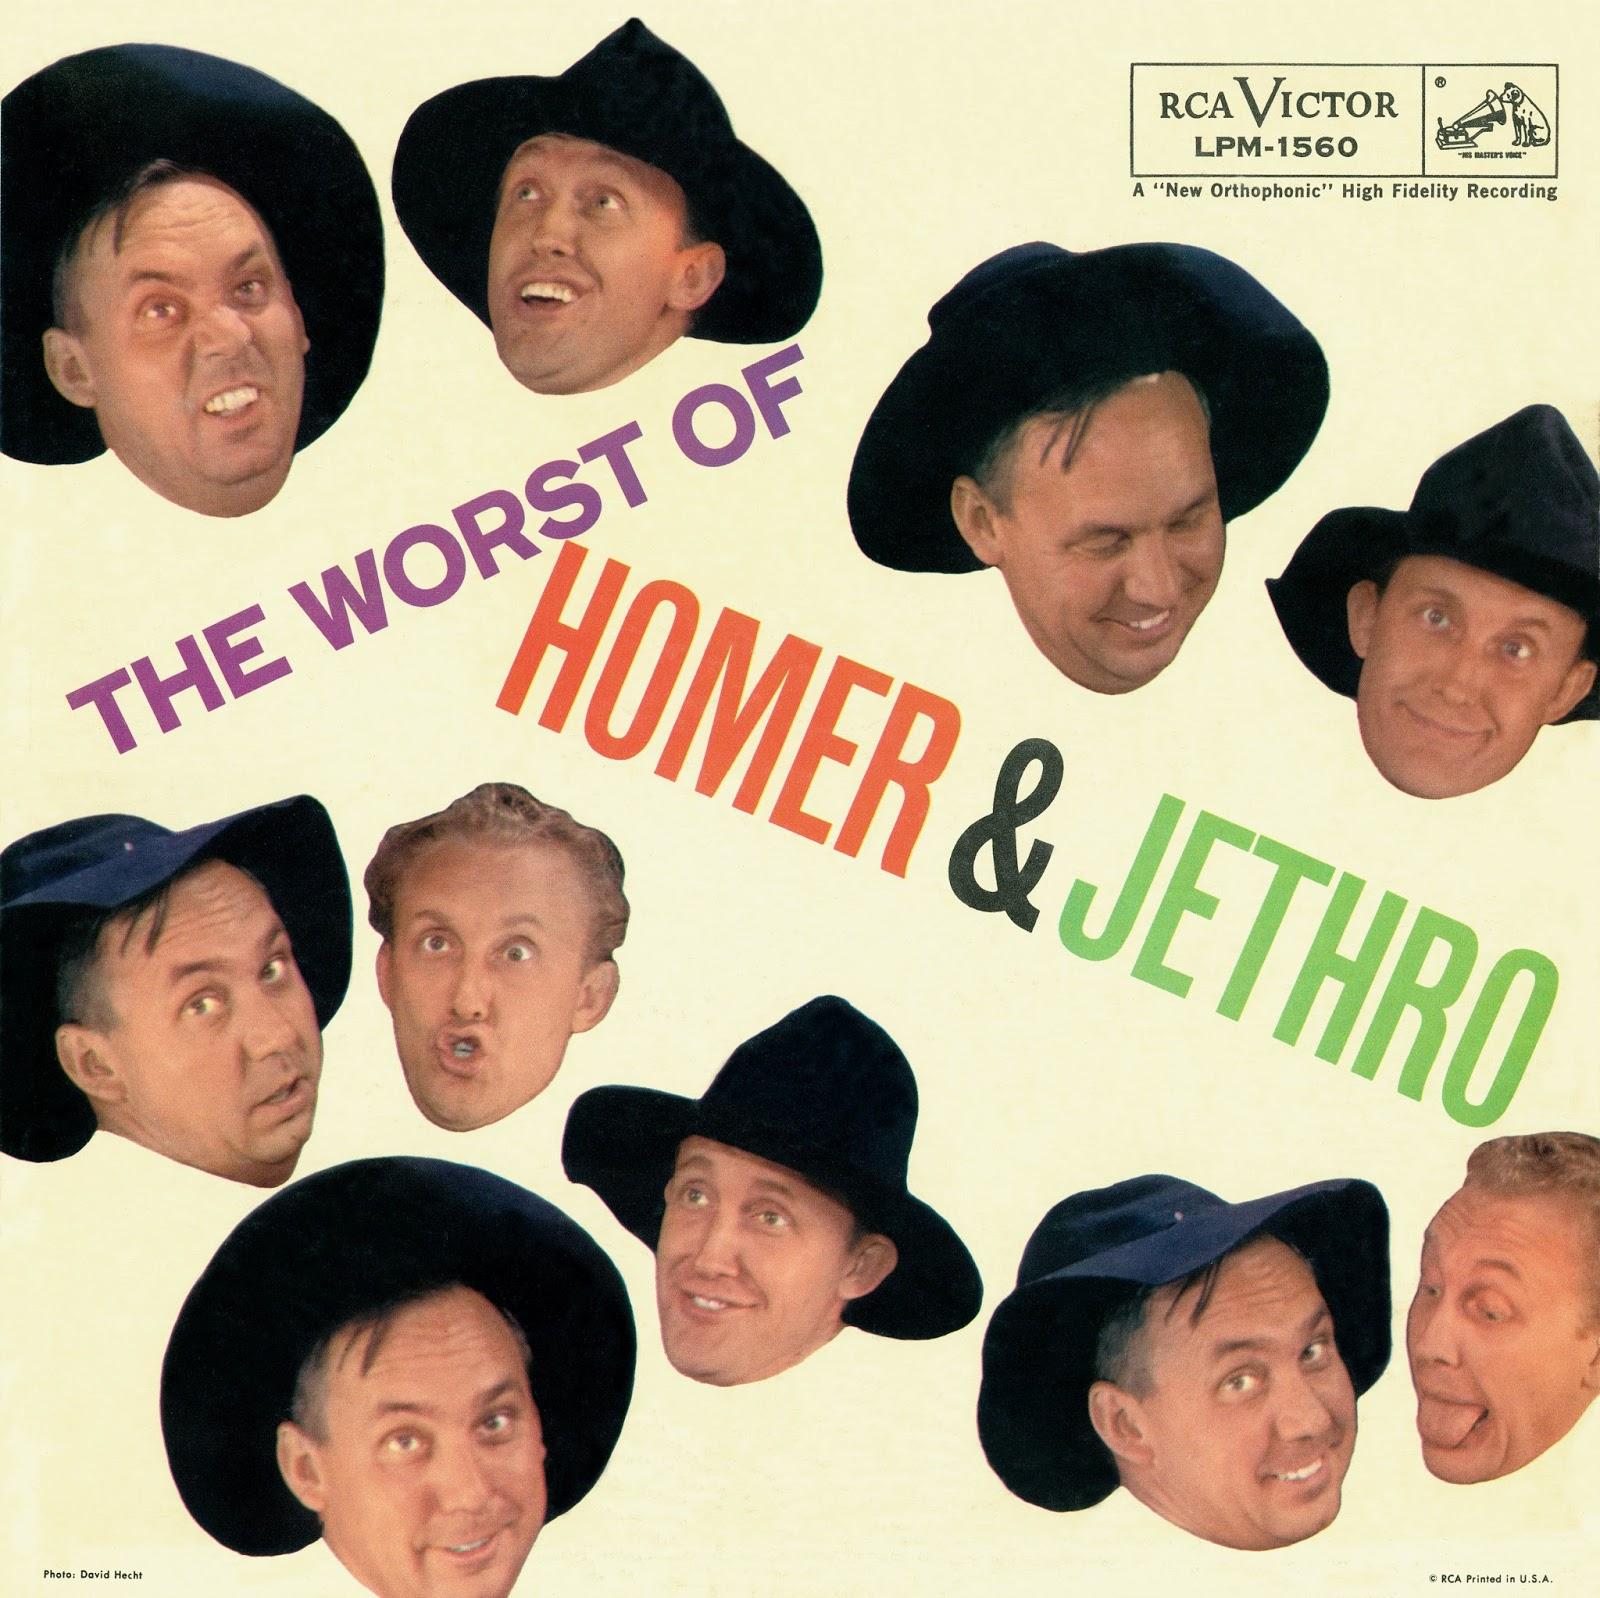 Homer And Jethro - Nuttin' For Christmas